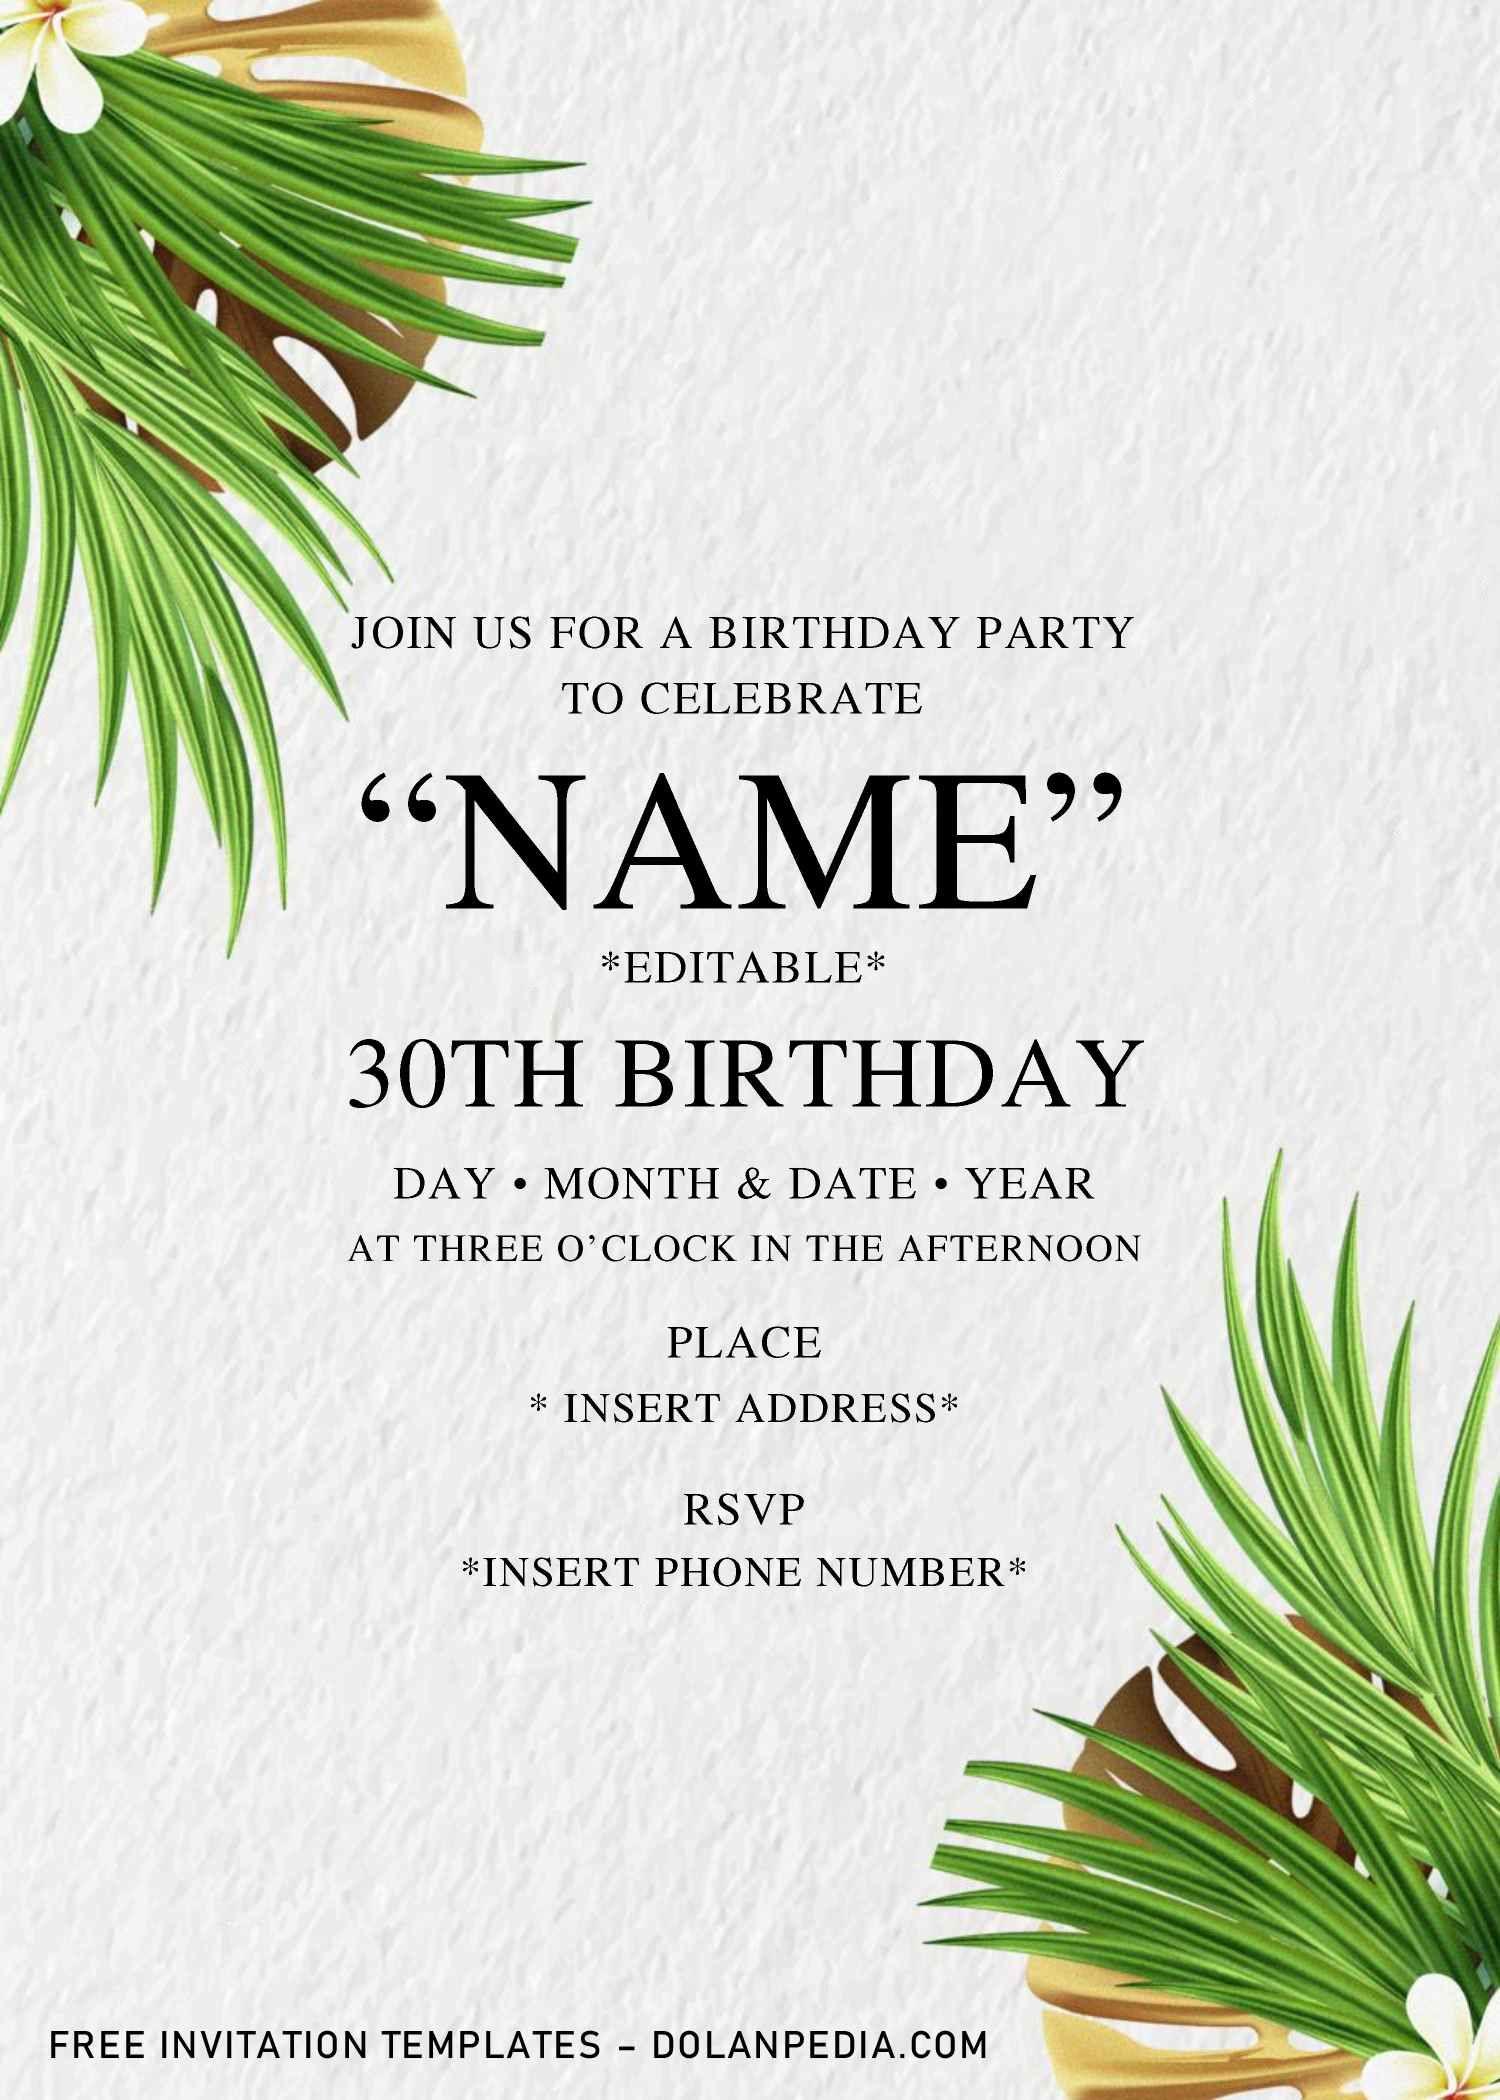 Greenery Birthday Invitation Templates Editable With Microsoft Word Birthday Invitation Templates Invitation Template Birthday Invitations Party invitation templates microsoft word